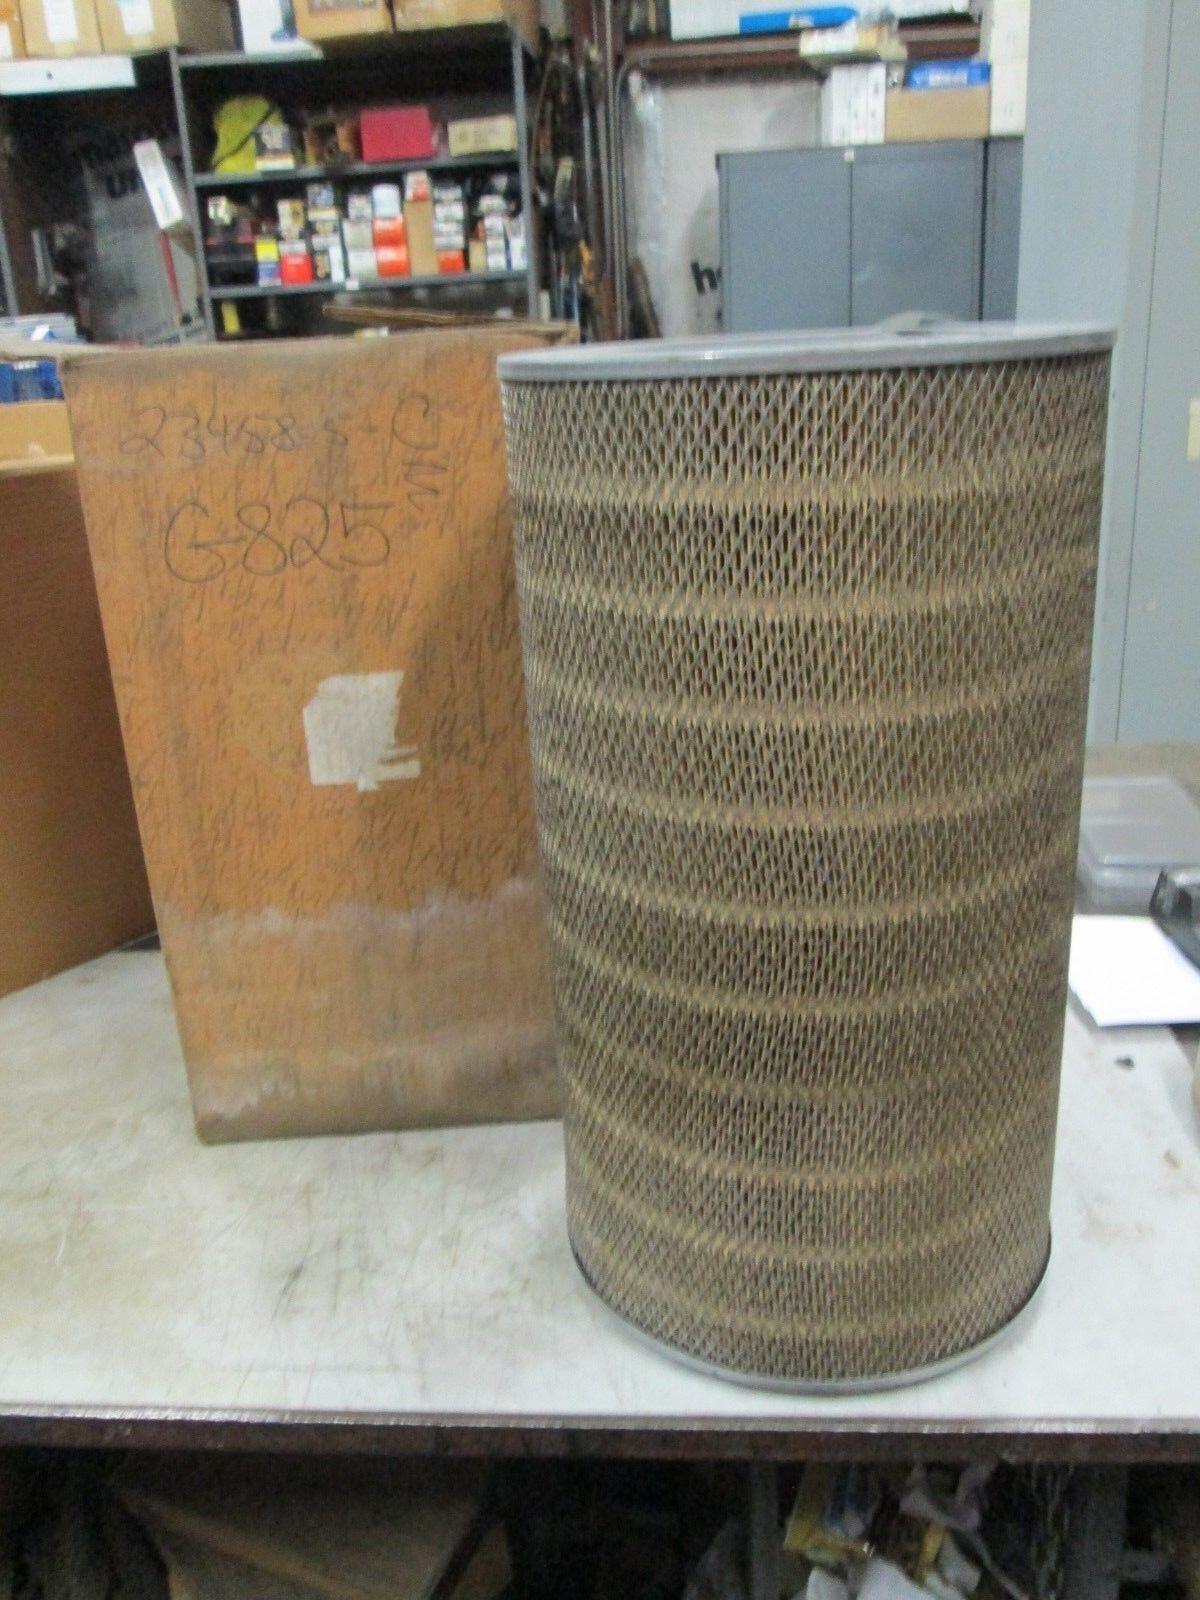 Quincy 111146E075 A424 Air Compressor Air Intake Filter Element Standard